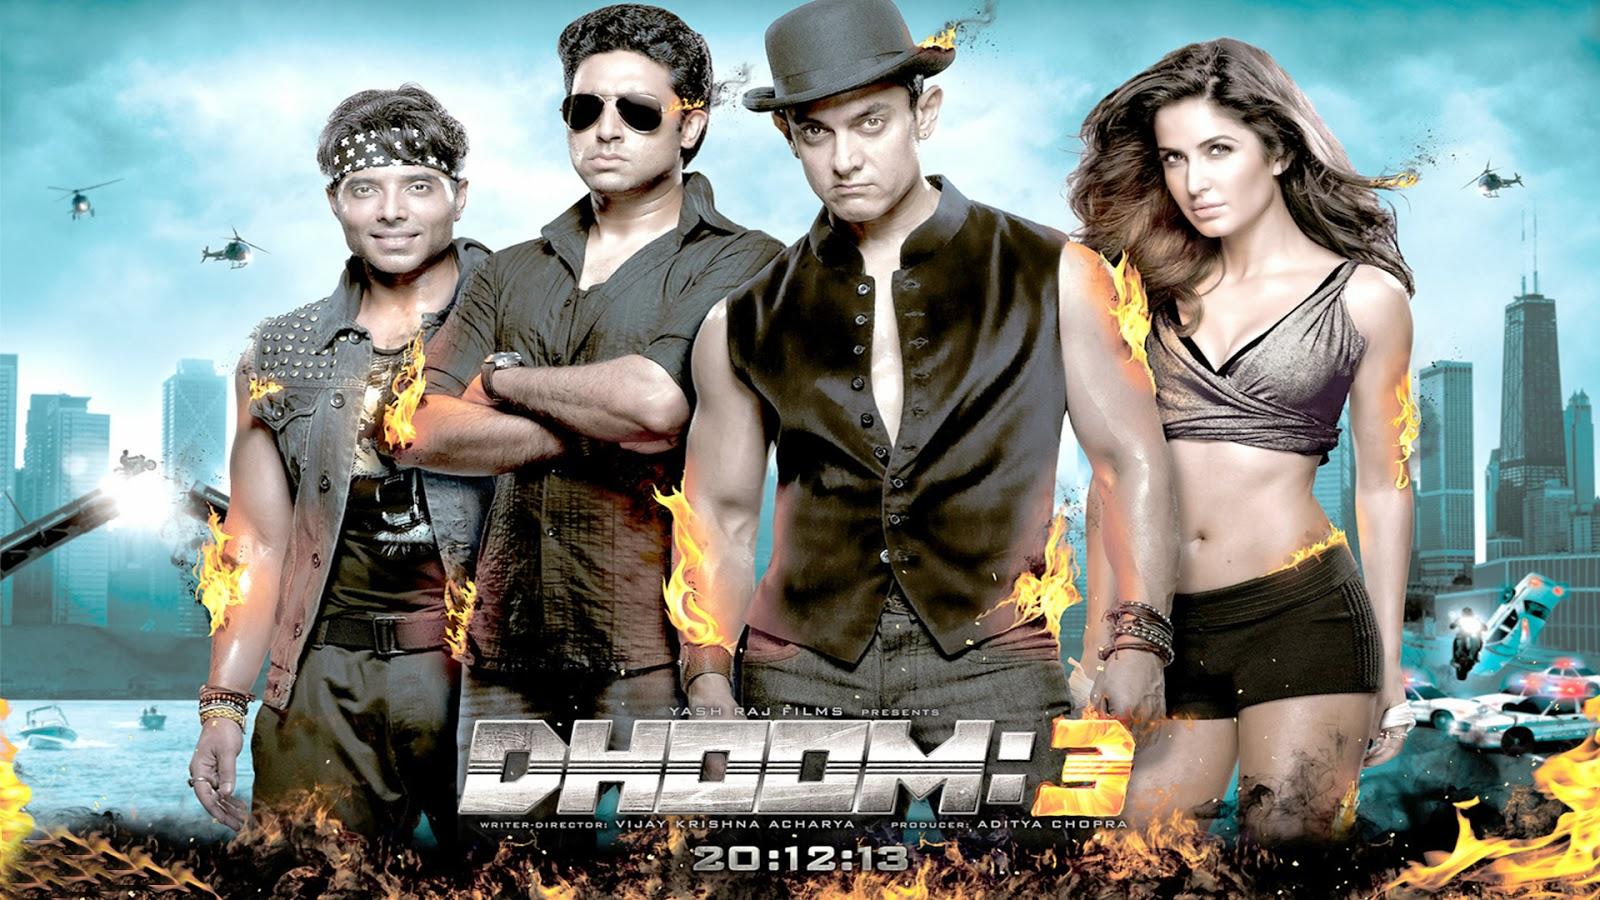 Download Dhoom 3 Songs - Dhoom 3 2013 Mp3 Songs